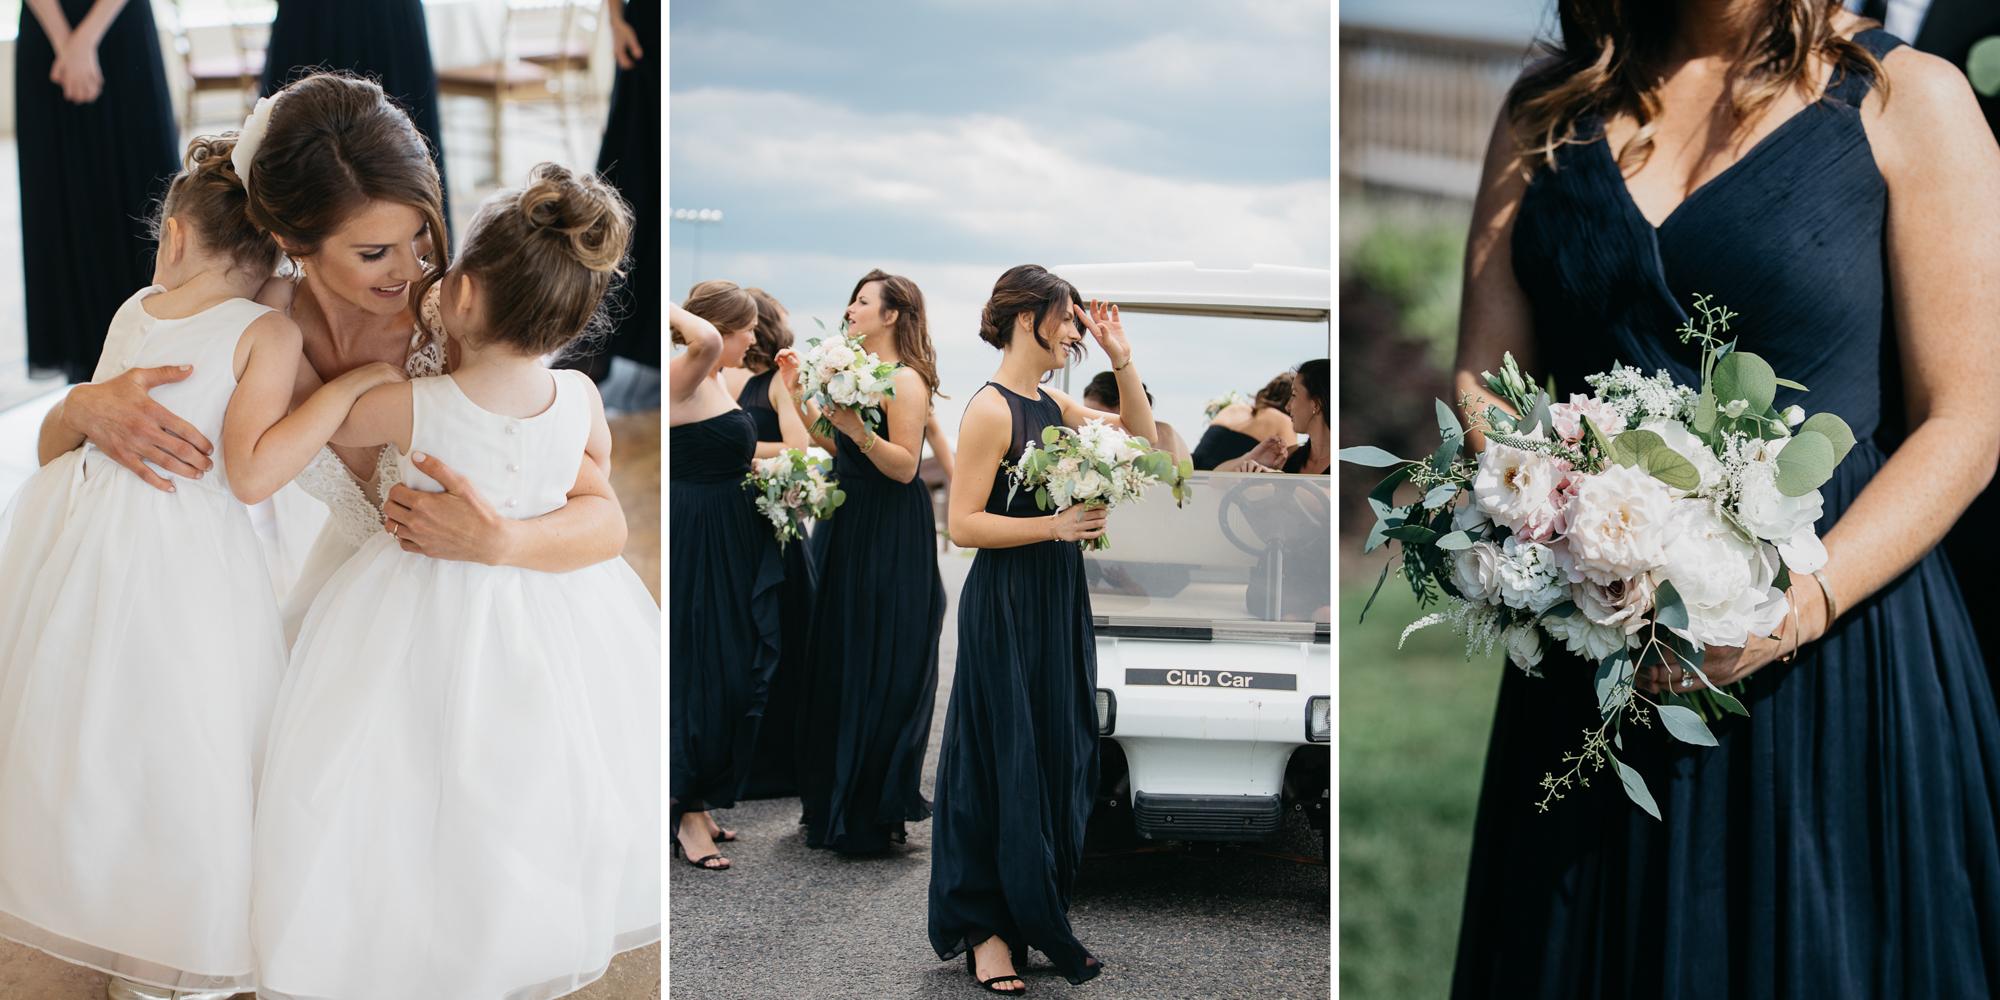 Jaclyn_Andrew_quincy_massachusetts_wedding009.jpg